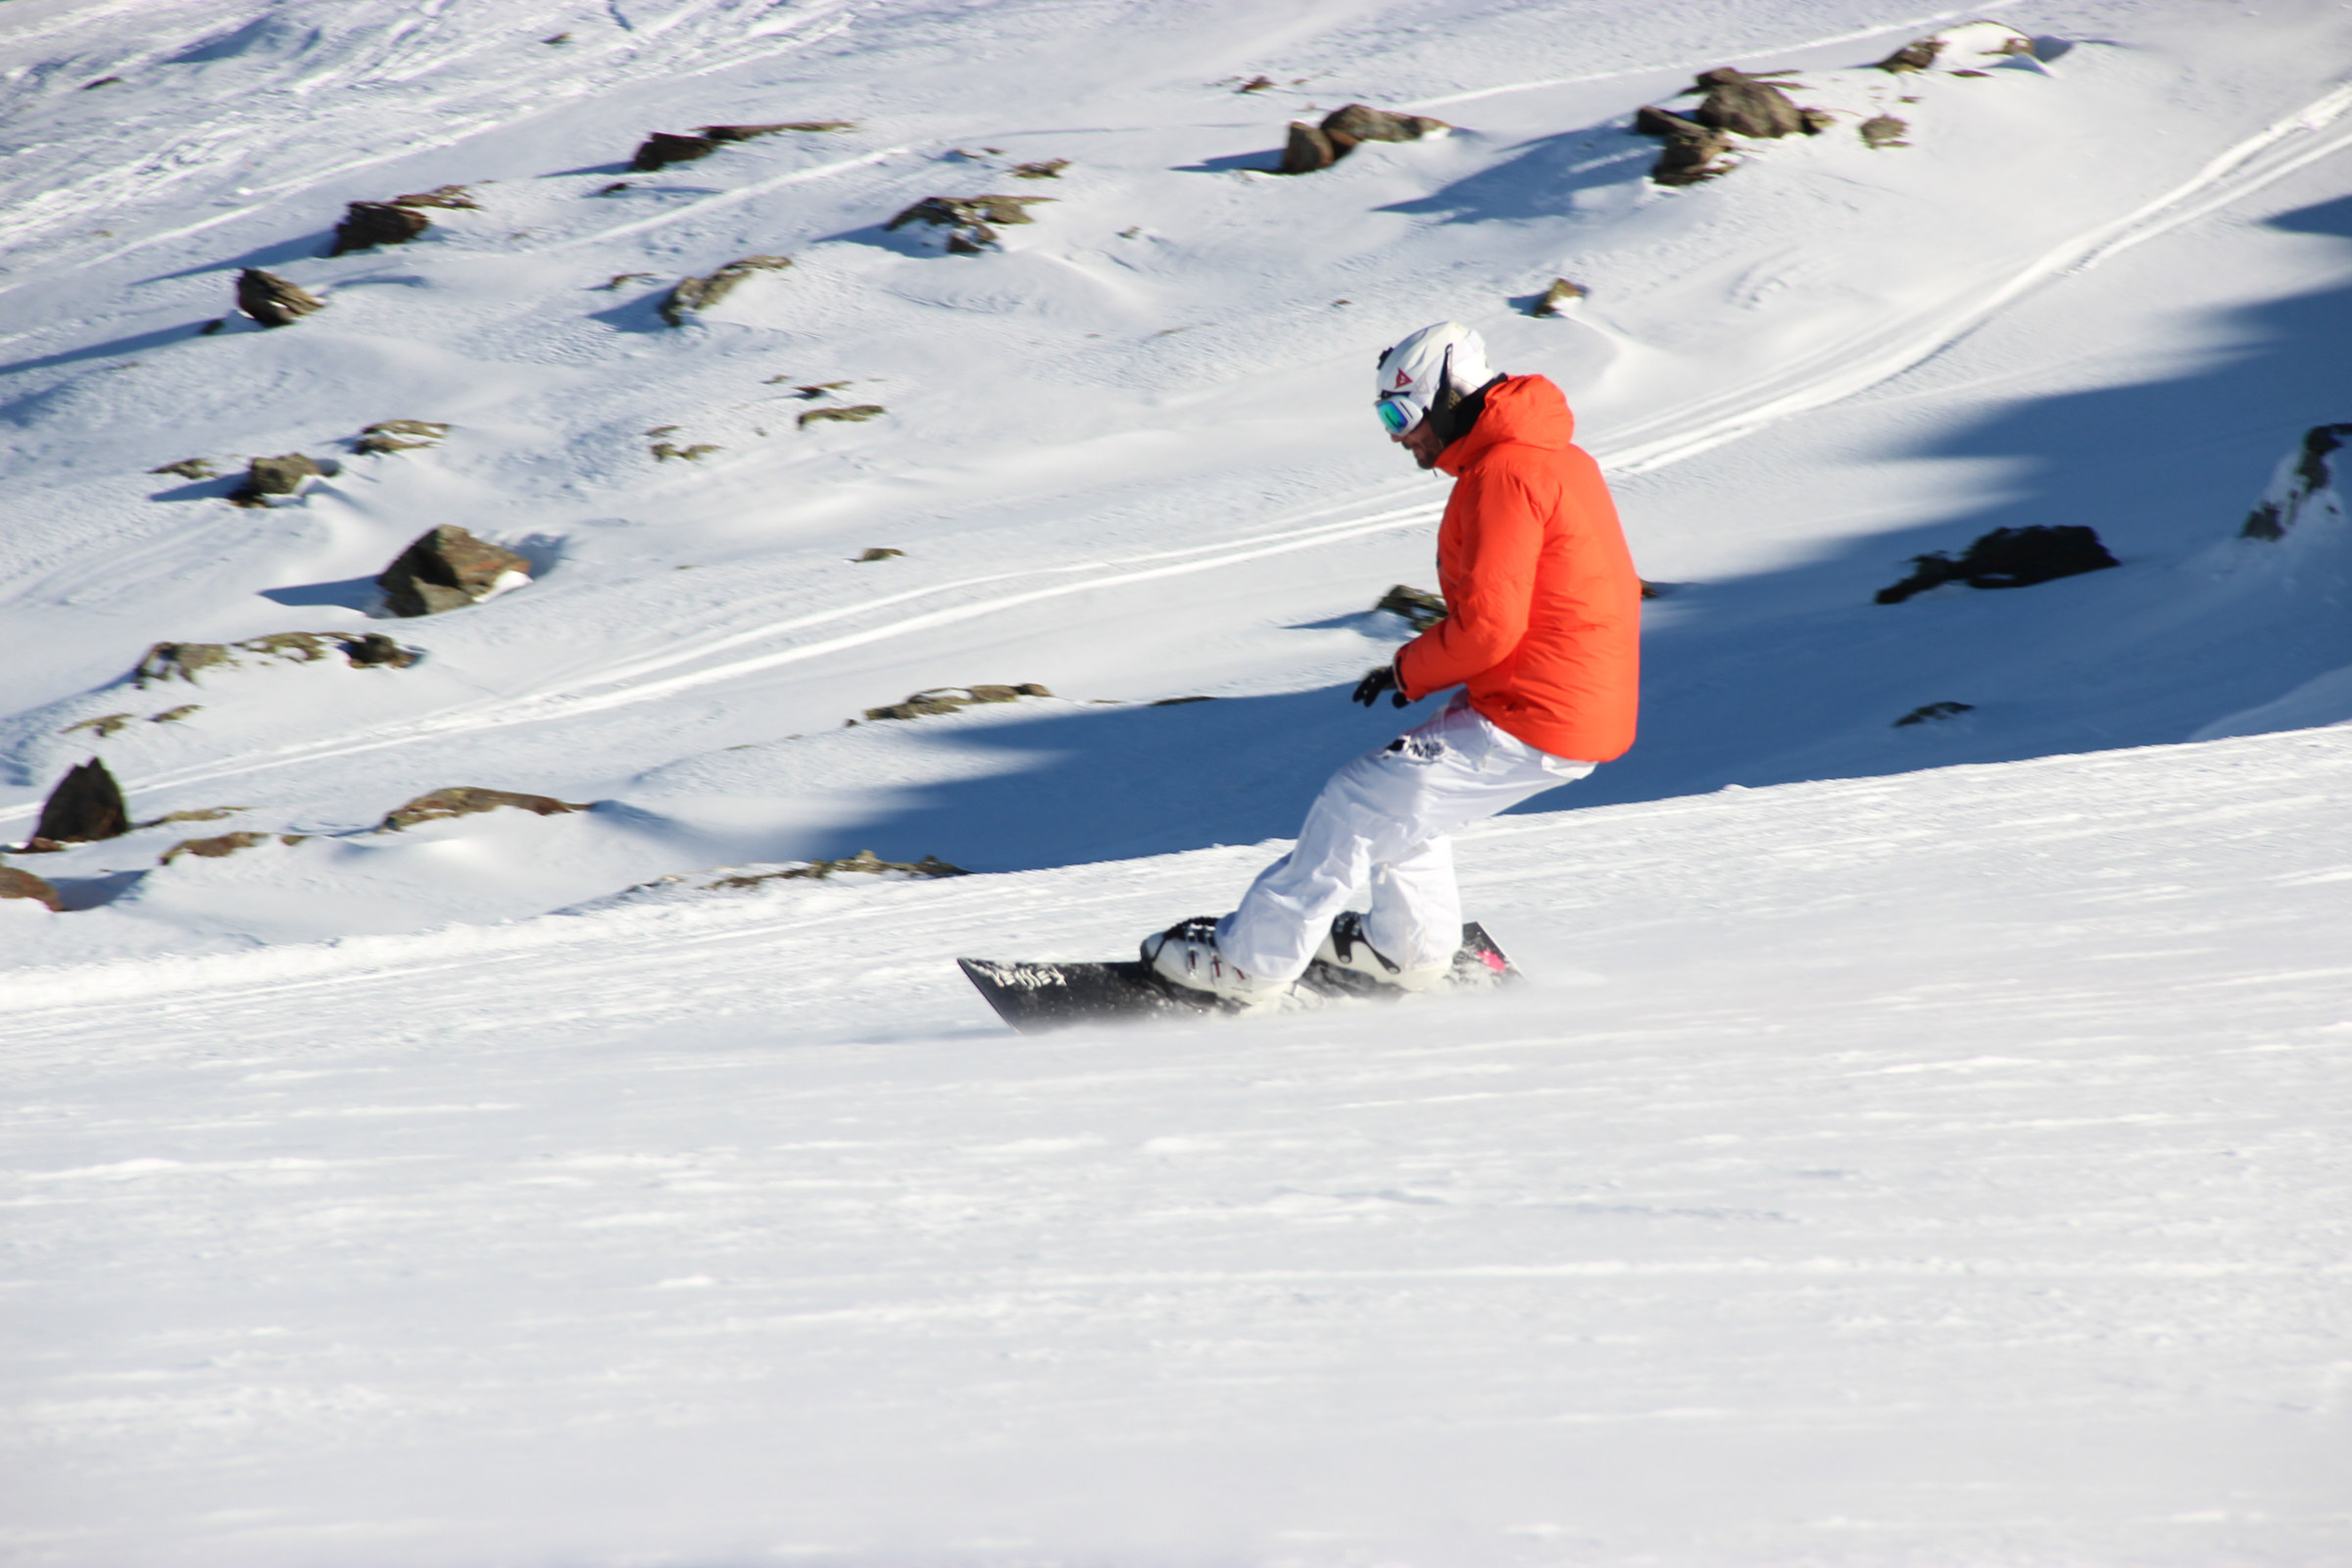 homme en snowboard